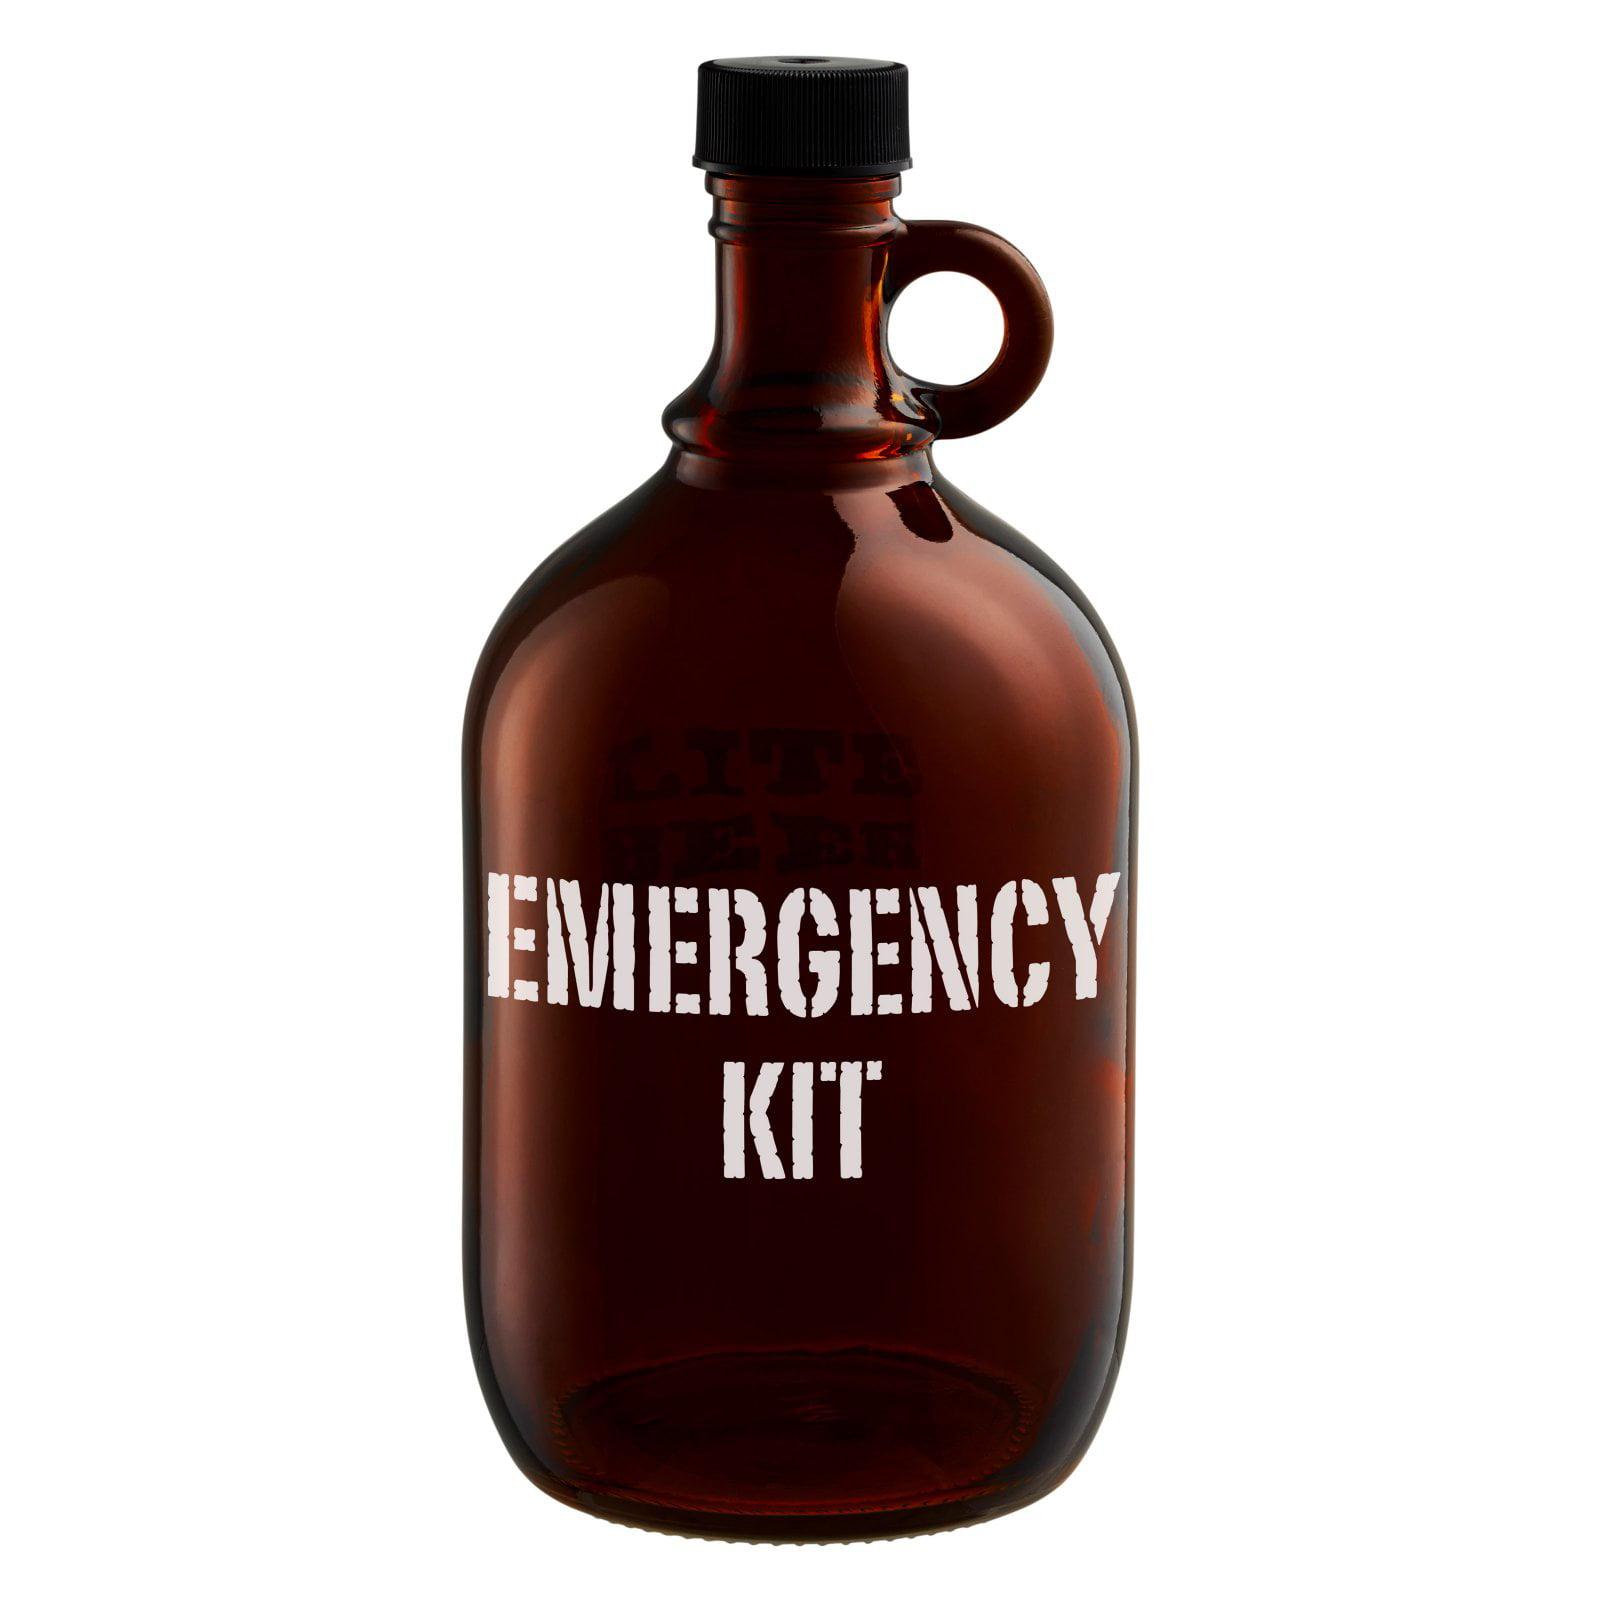 Artland Barkeep Emergency Kit Beer Growler